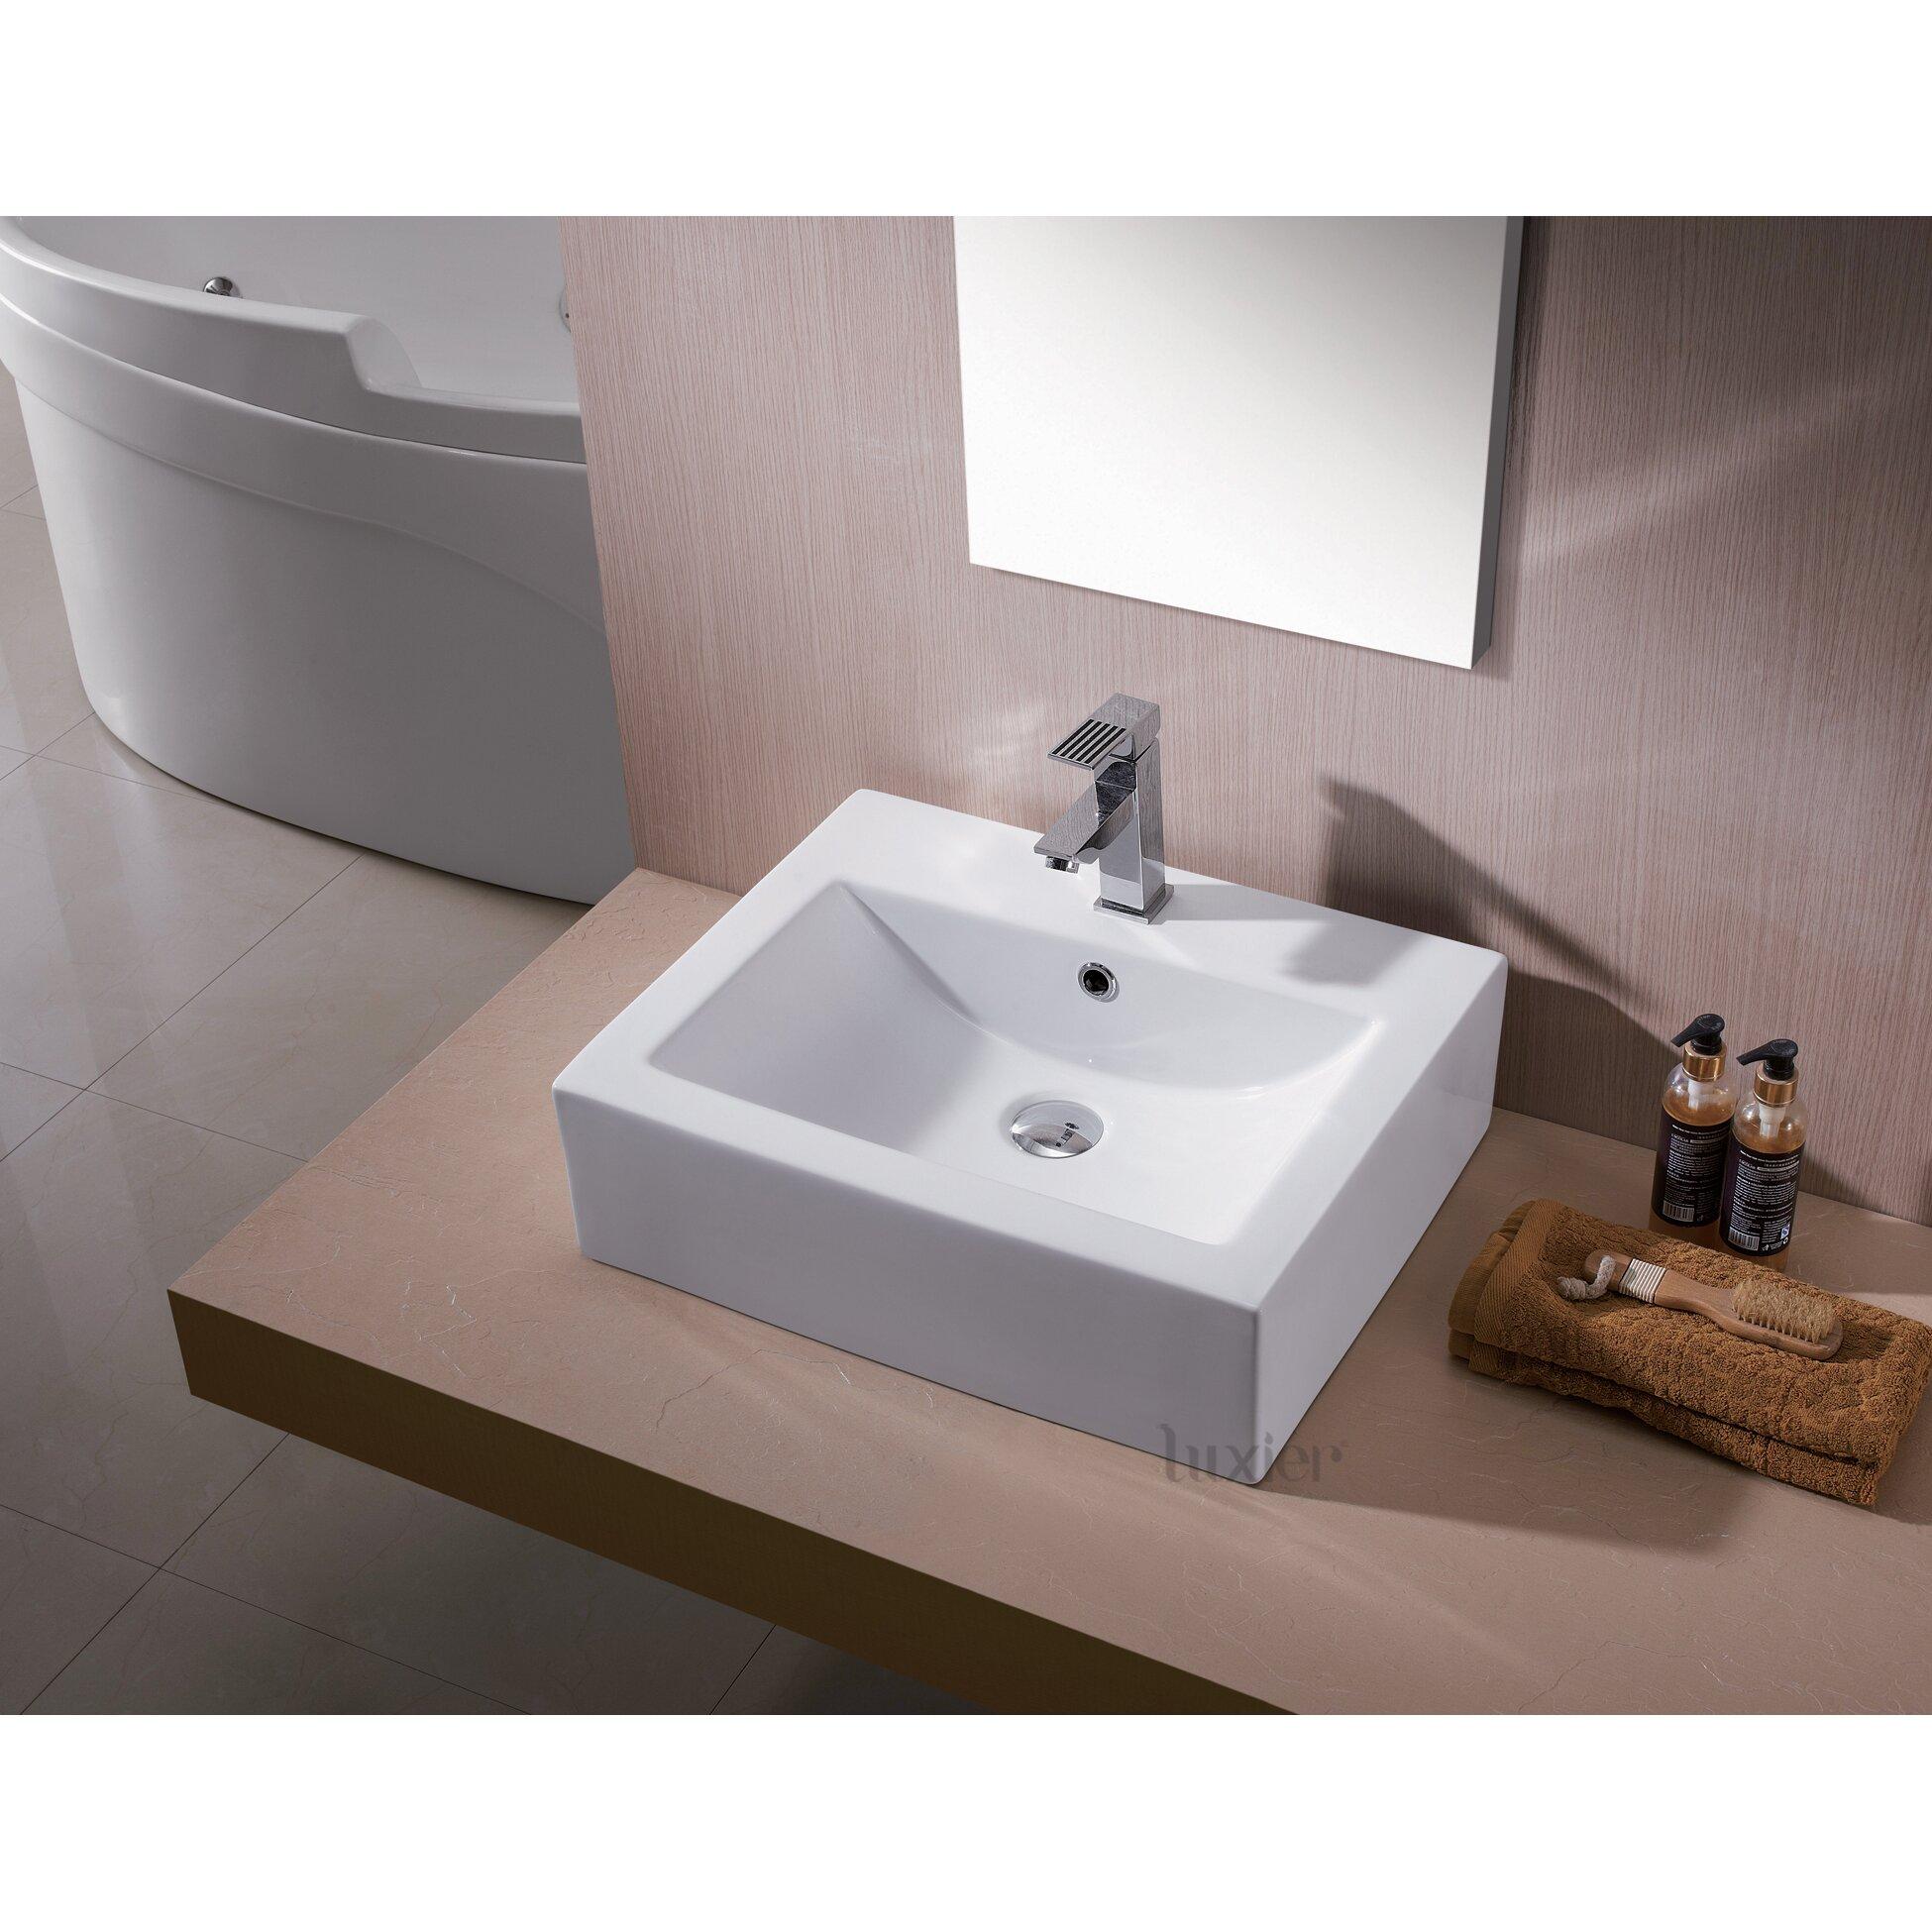 Ceramic Bathroom Basin : Luxier L-003 Bathroom Porcelain Ceramic Vessel Vanity Sink Art Basin ...